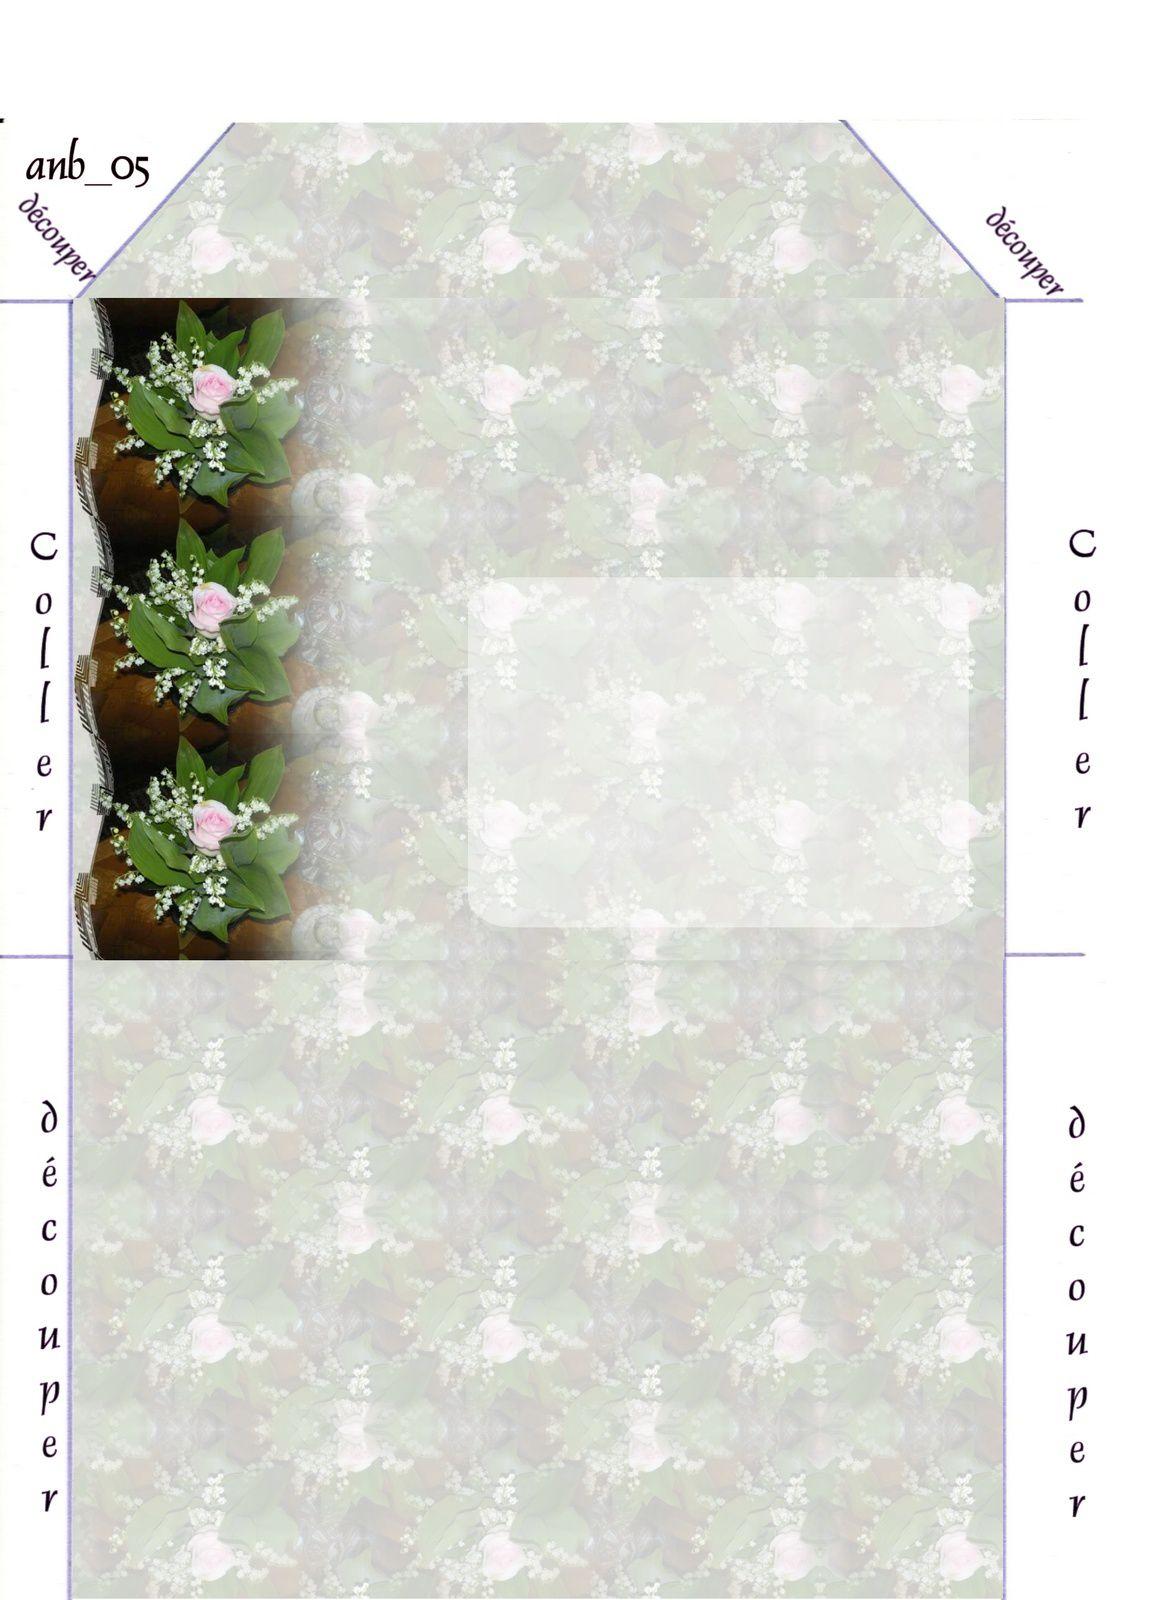 Muguets avec rose IM &amp&#x3B; Papier A4 h l &amp&#x3B; outlook &amp&#x3B; enveloppe &amp&#x3B; 2 cartes A5 fleurs_dscn0512_1ermai2008_lea